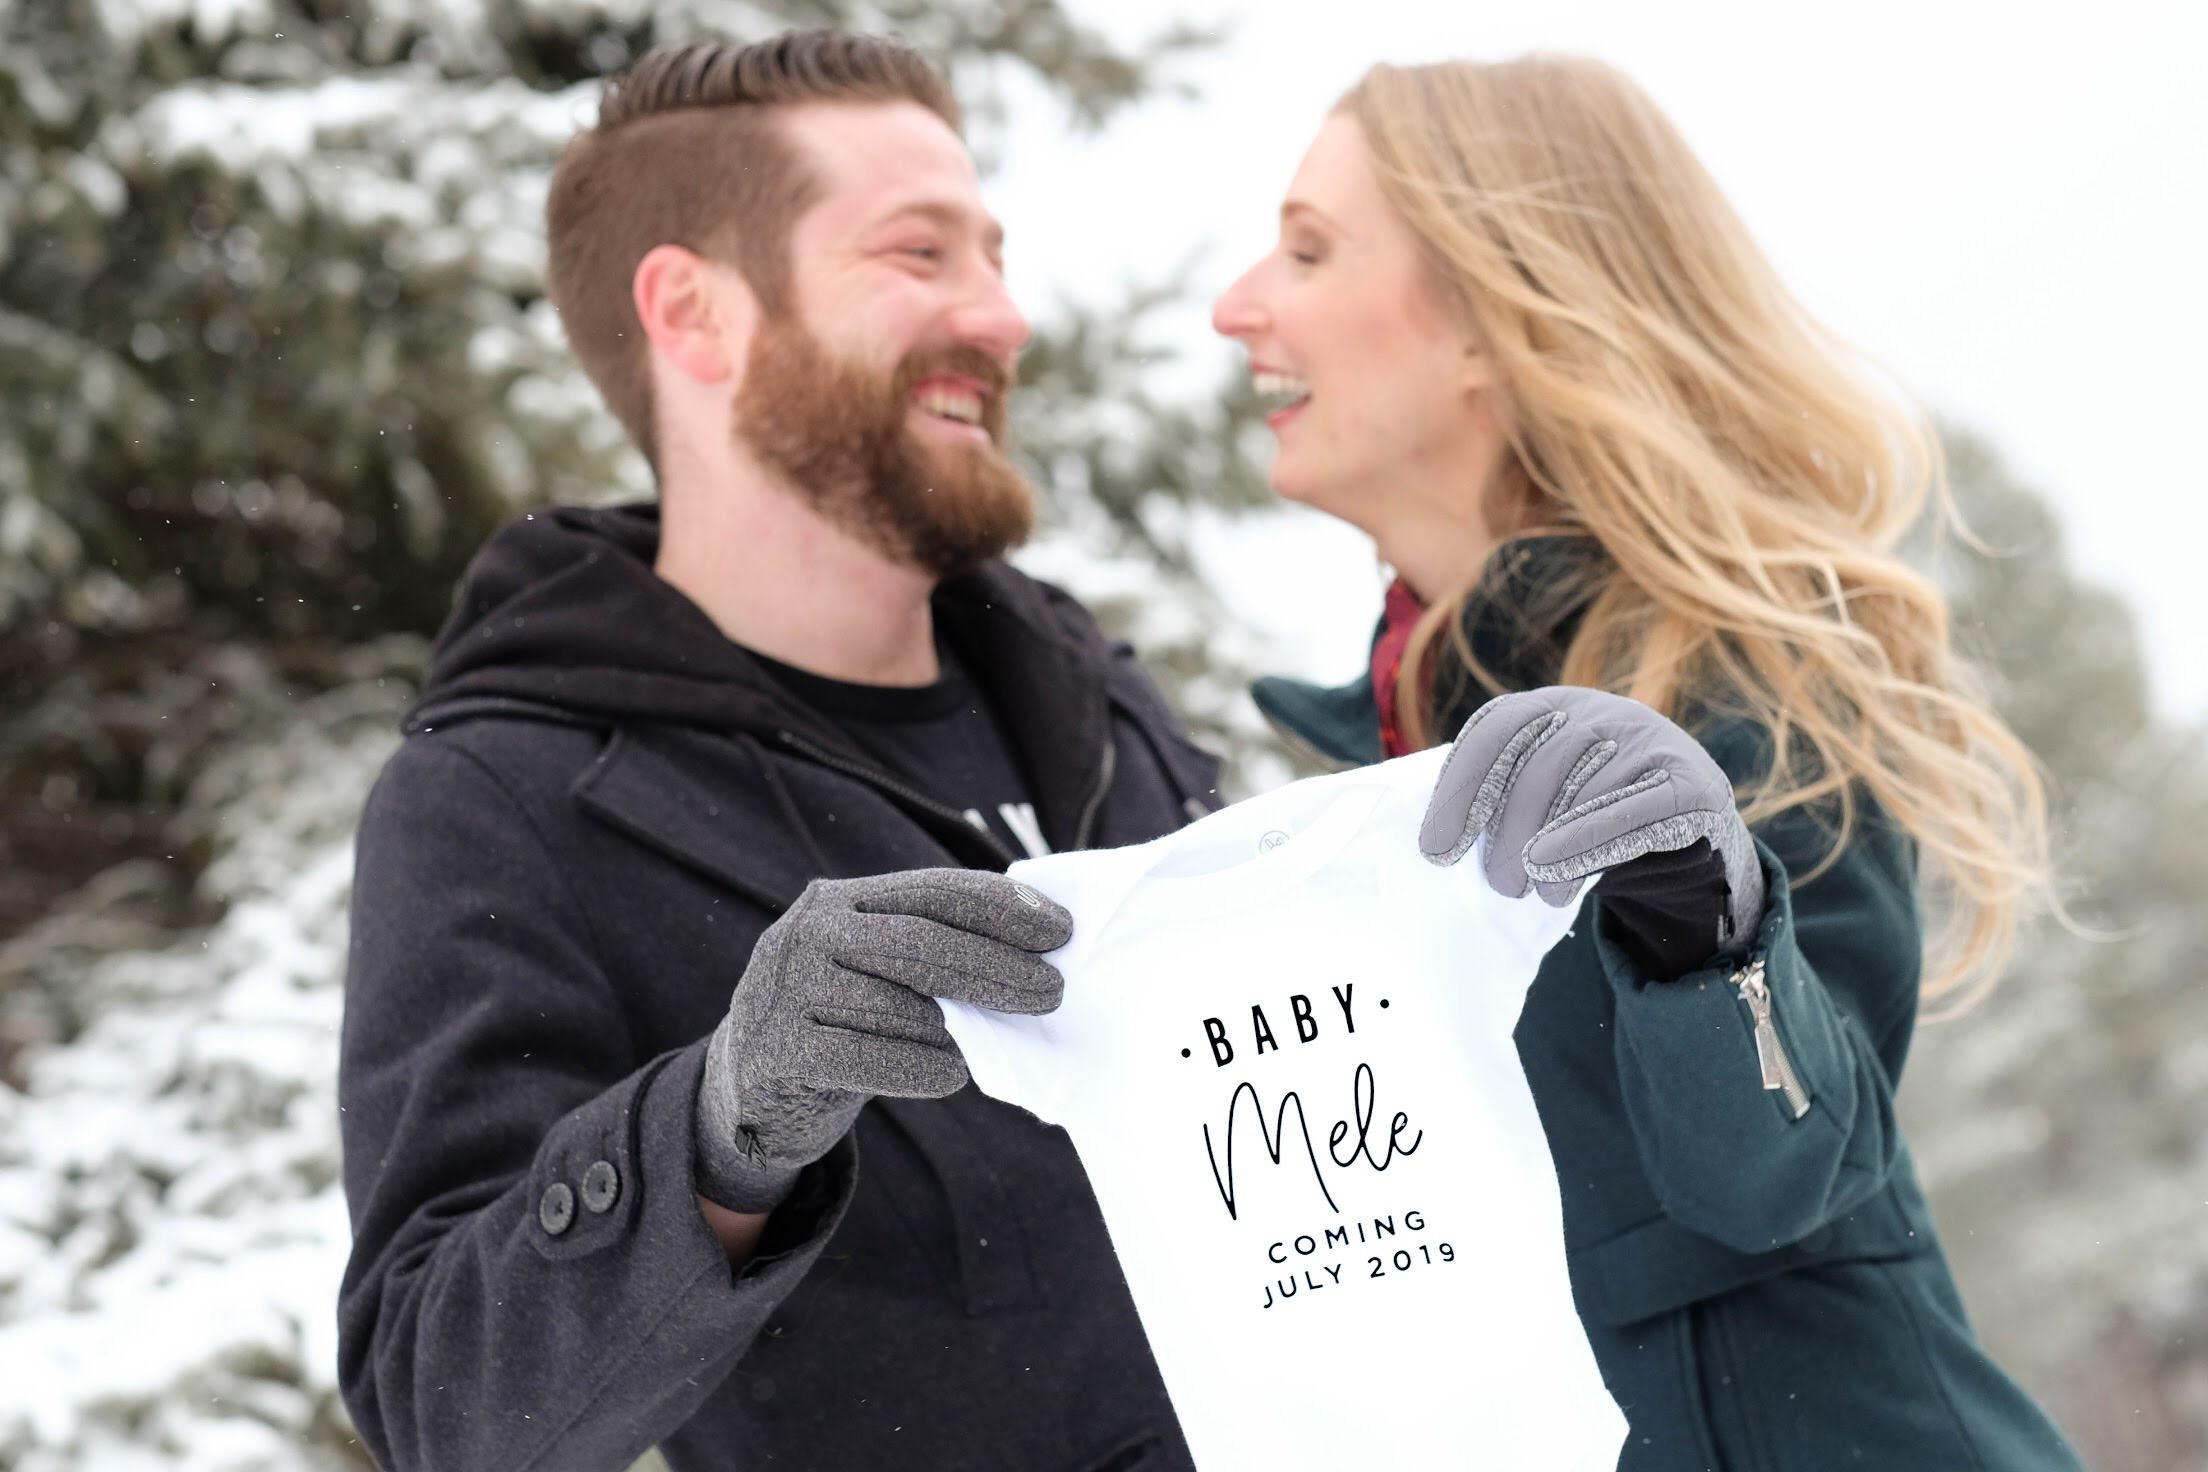 Mele Pregnancy Announcement - The Style Shop by Sandi Mele